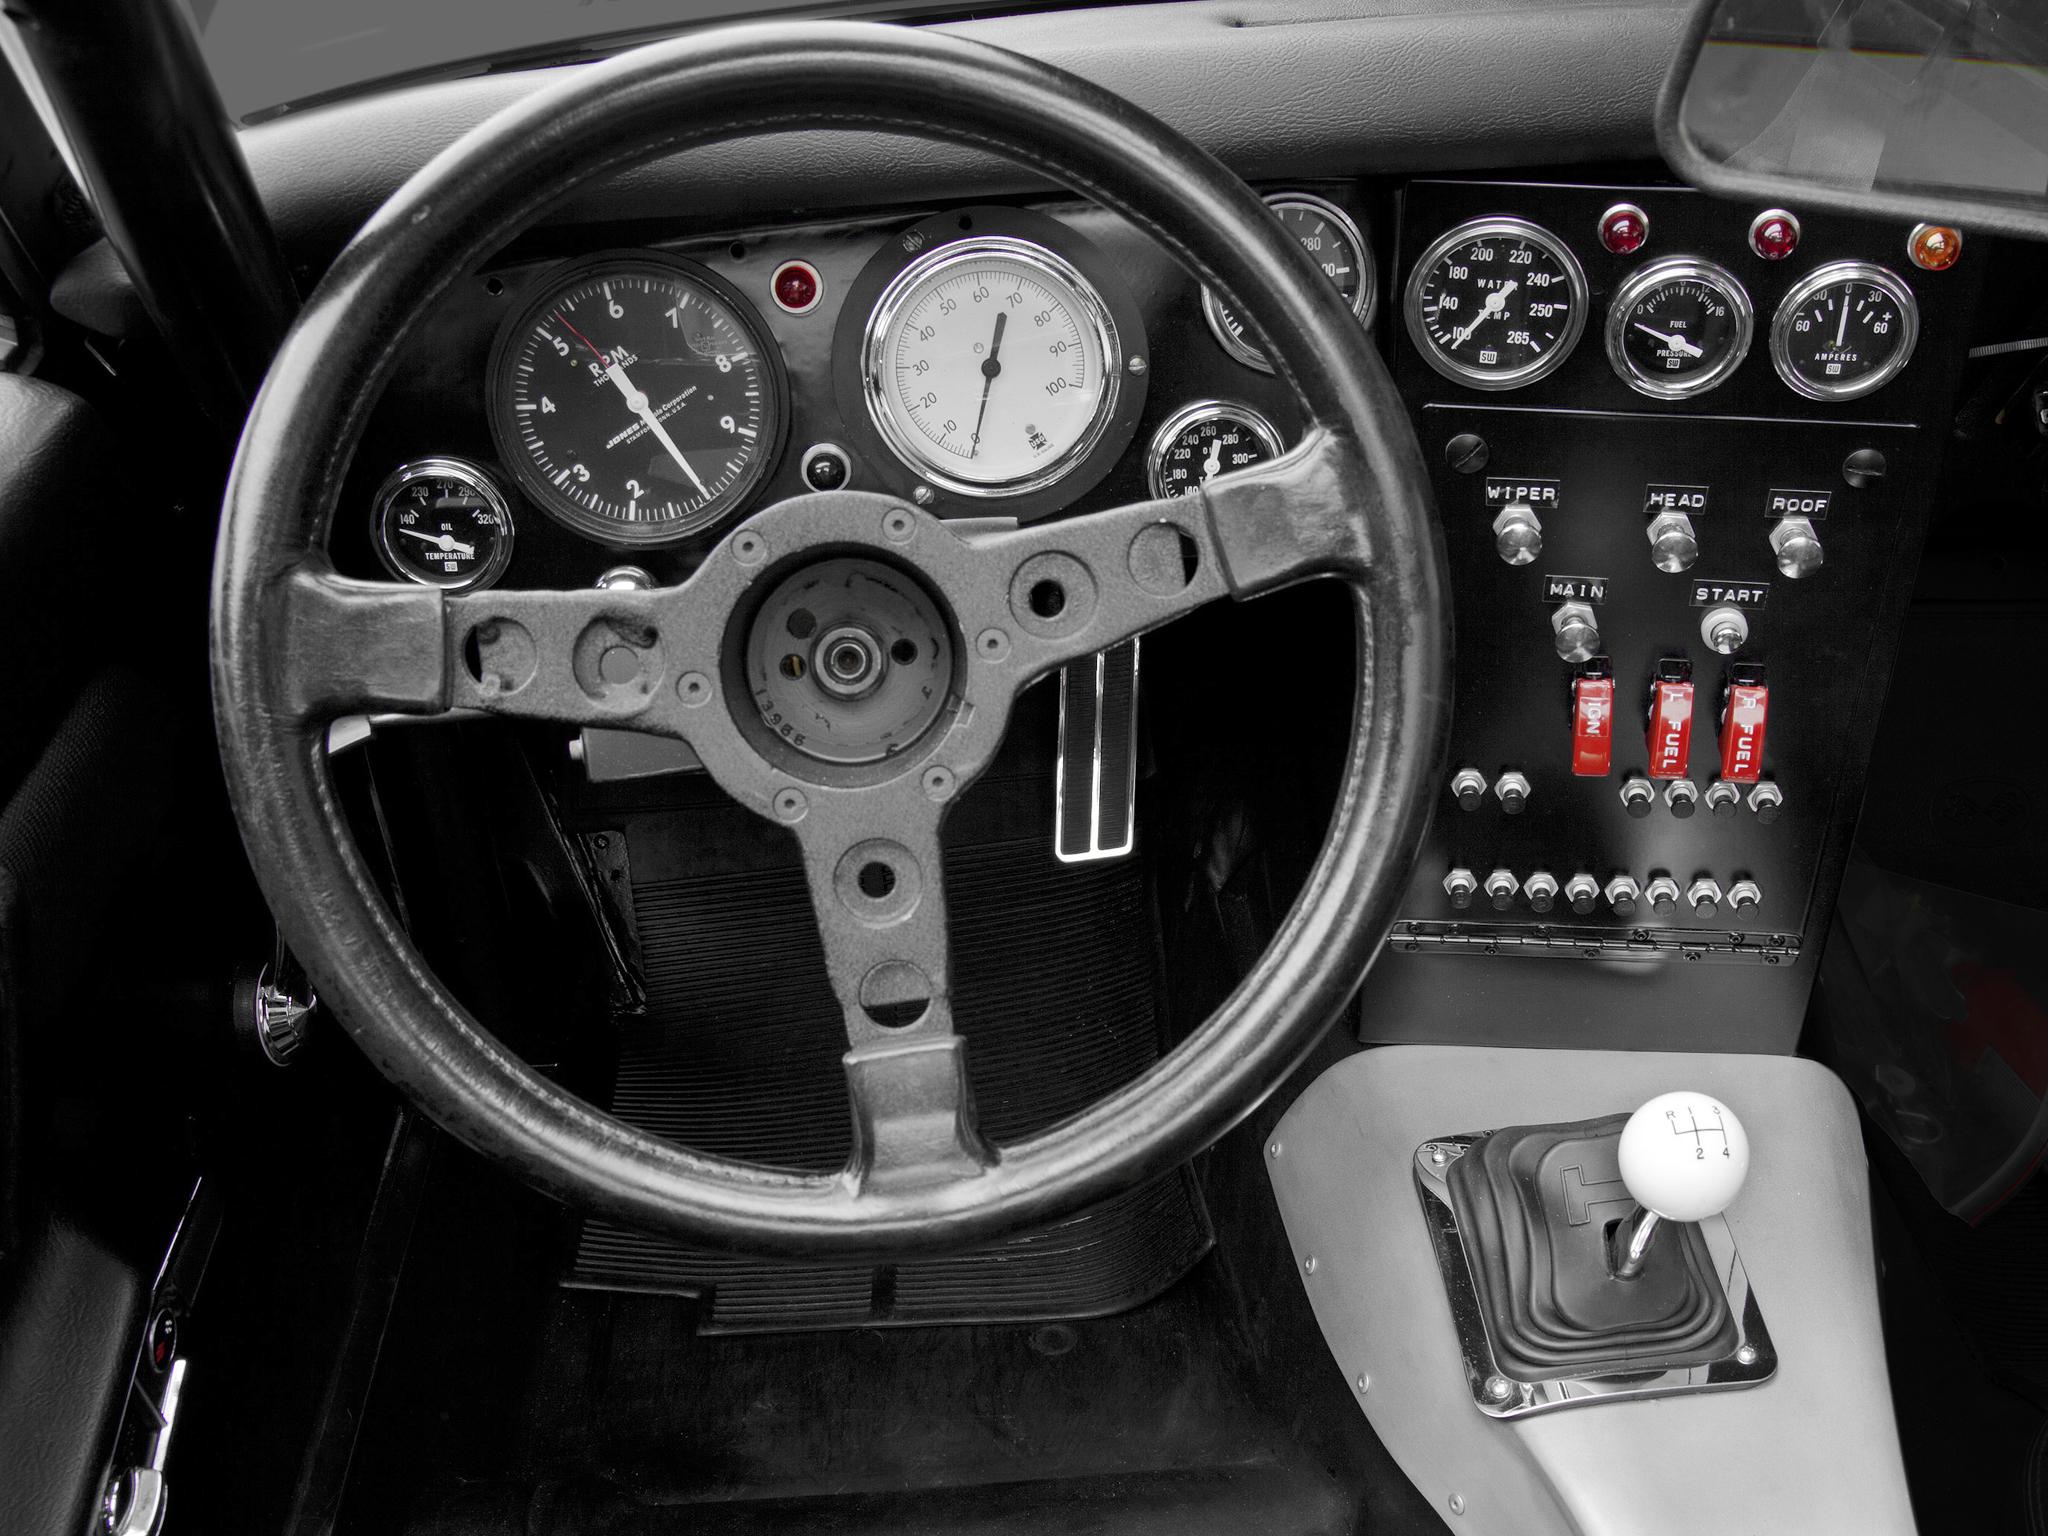 1972 chevrolet corvette stingray zl1 bfg john greenwood c 3 race racing supercar classic. Black Bedroom Furniture Sets. Home Design Ideas